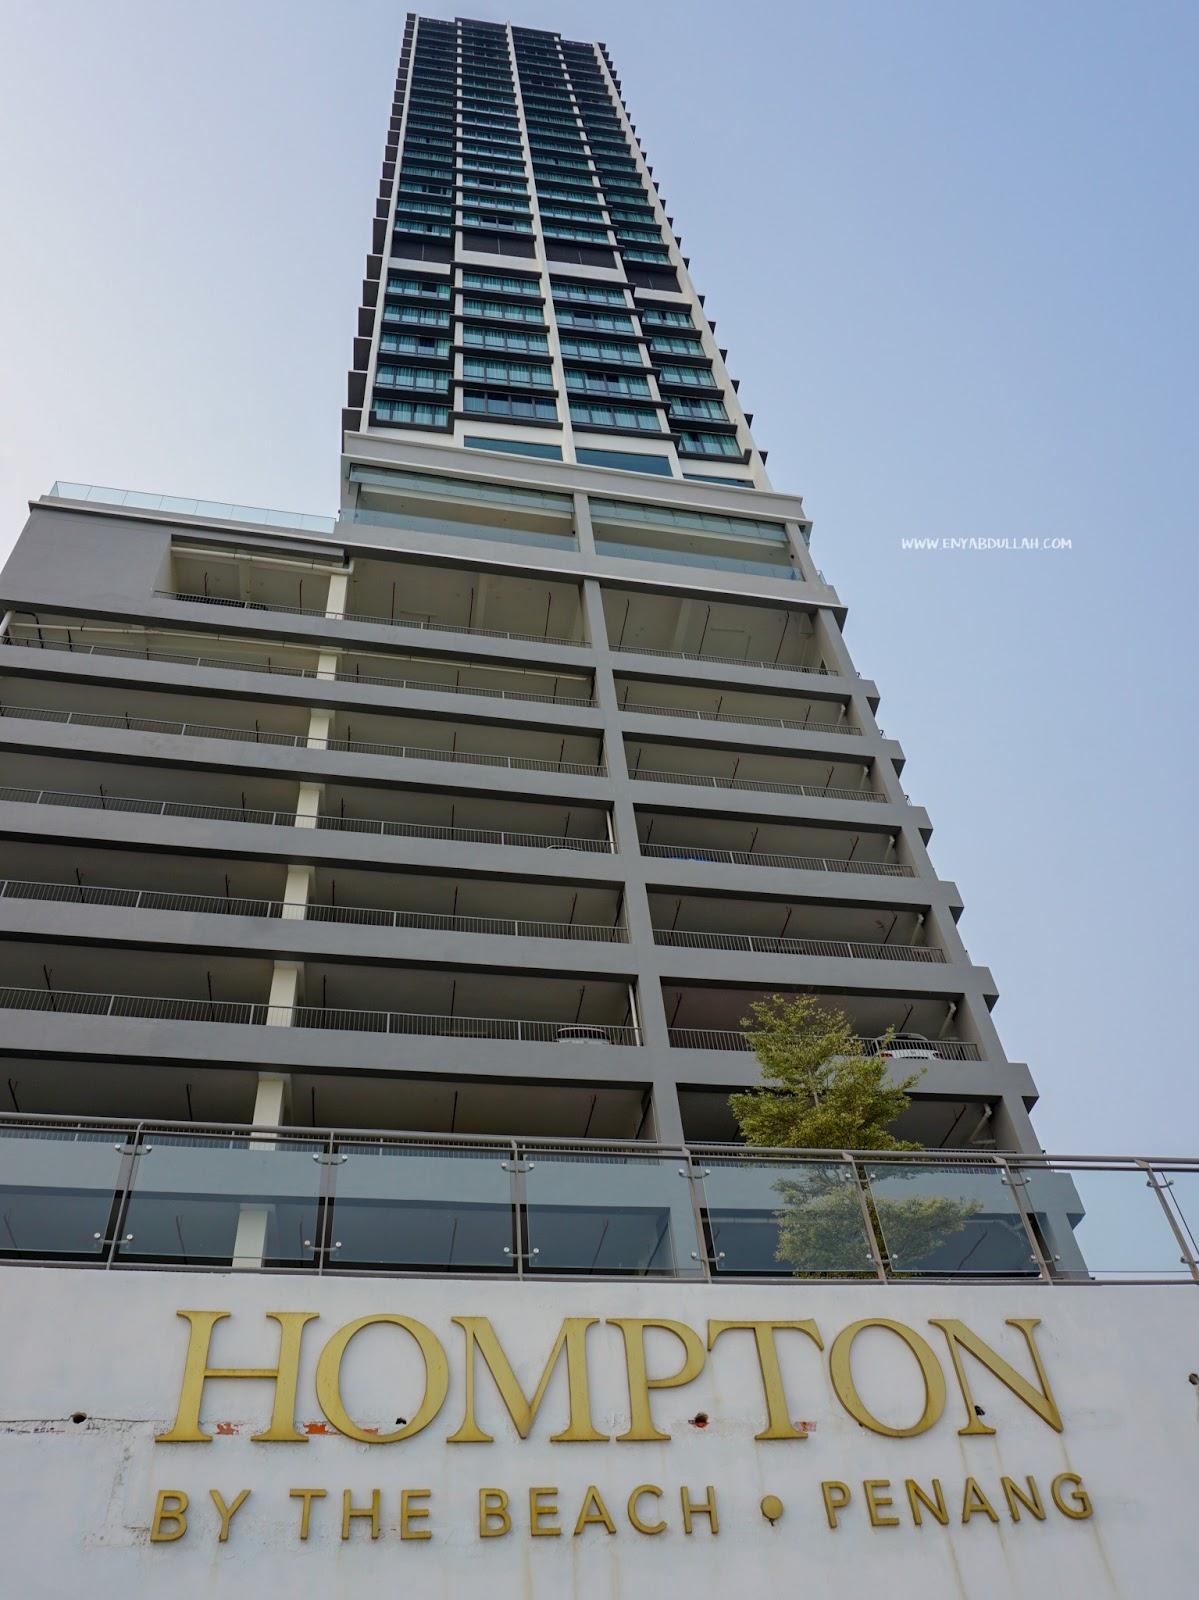 Hompton by the beach review, hompton hotel penang, review hotel hompton, hotel penang, hotel tanjung bungah, hotel murah penang